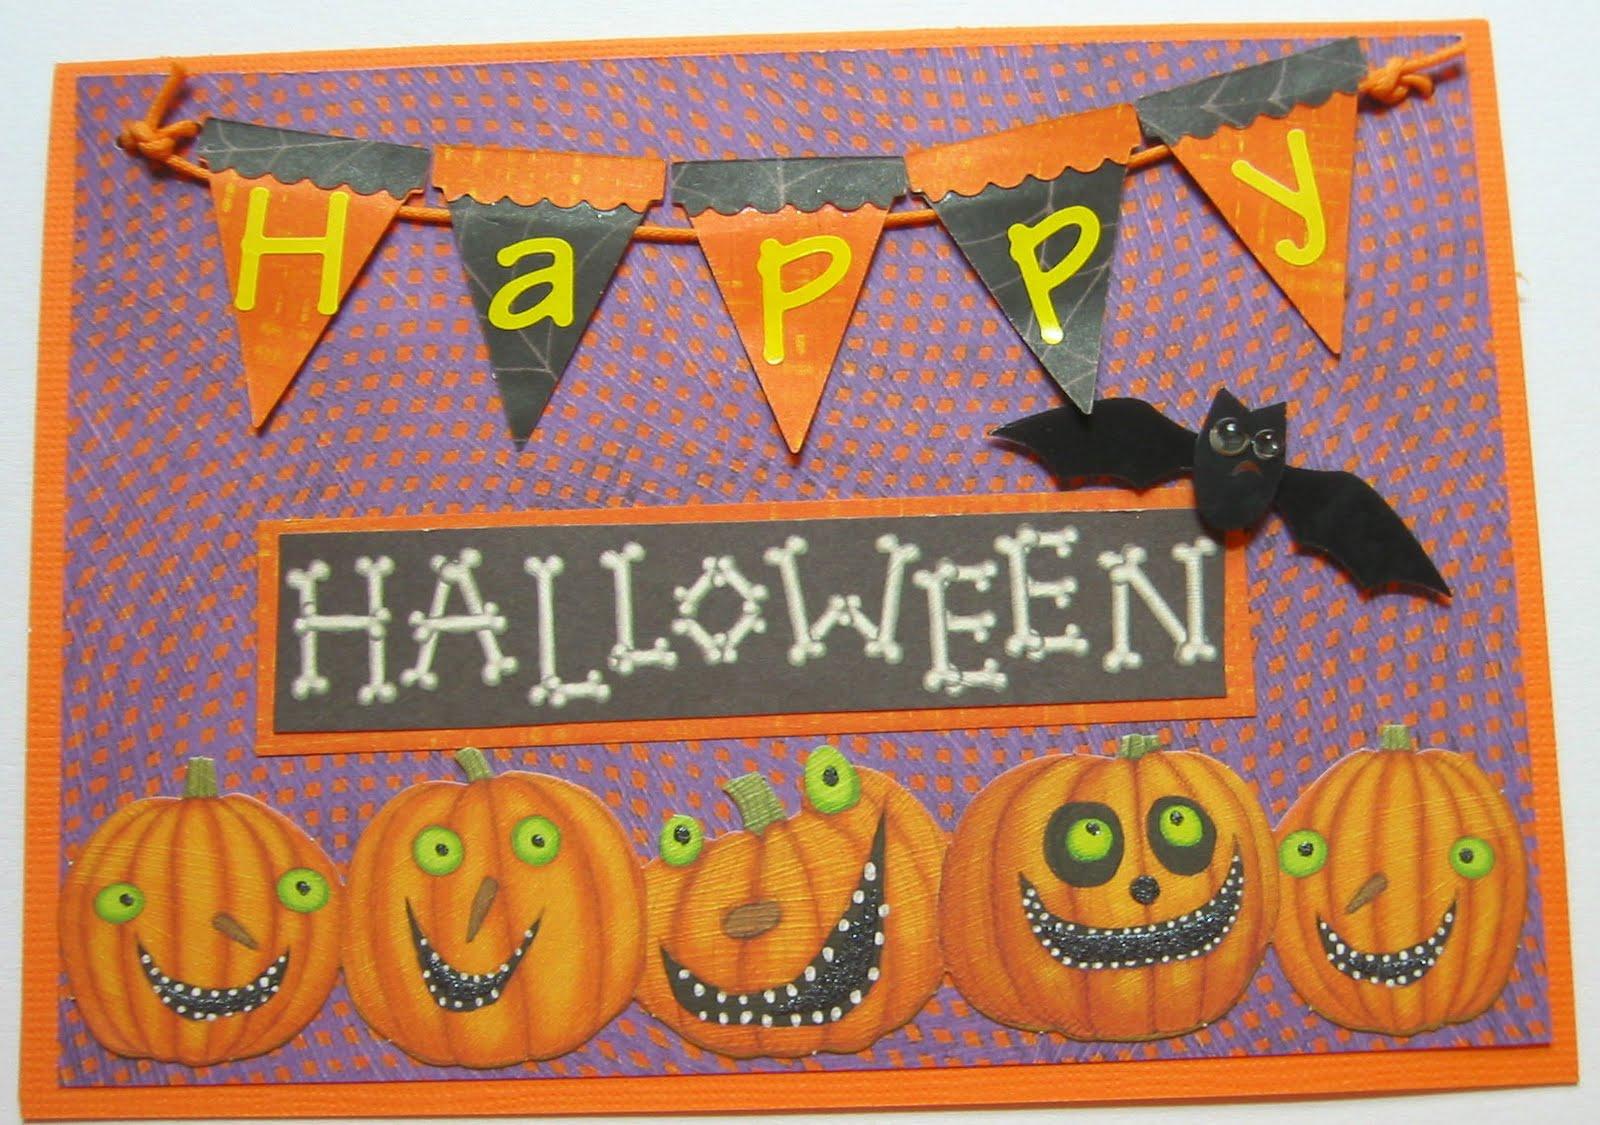 http://4.bp.blogspot.com/_3HRSa9TffEM/TGHReXEPsqI/AAAAAAAABY4/-kv6YINwgJ8/s1600/Halloween019.jpg